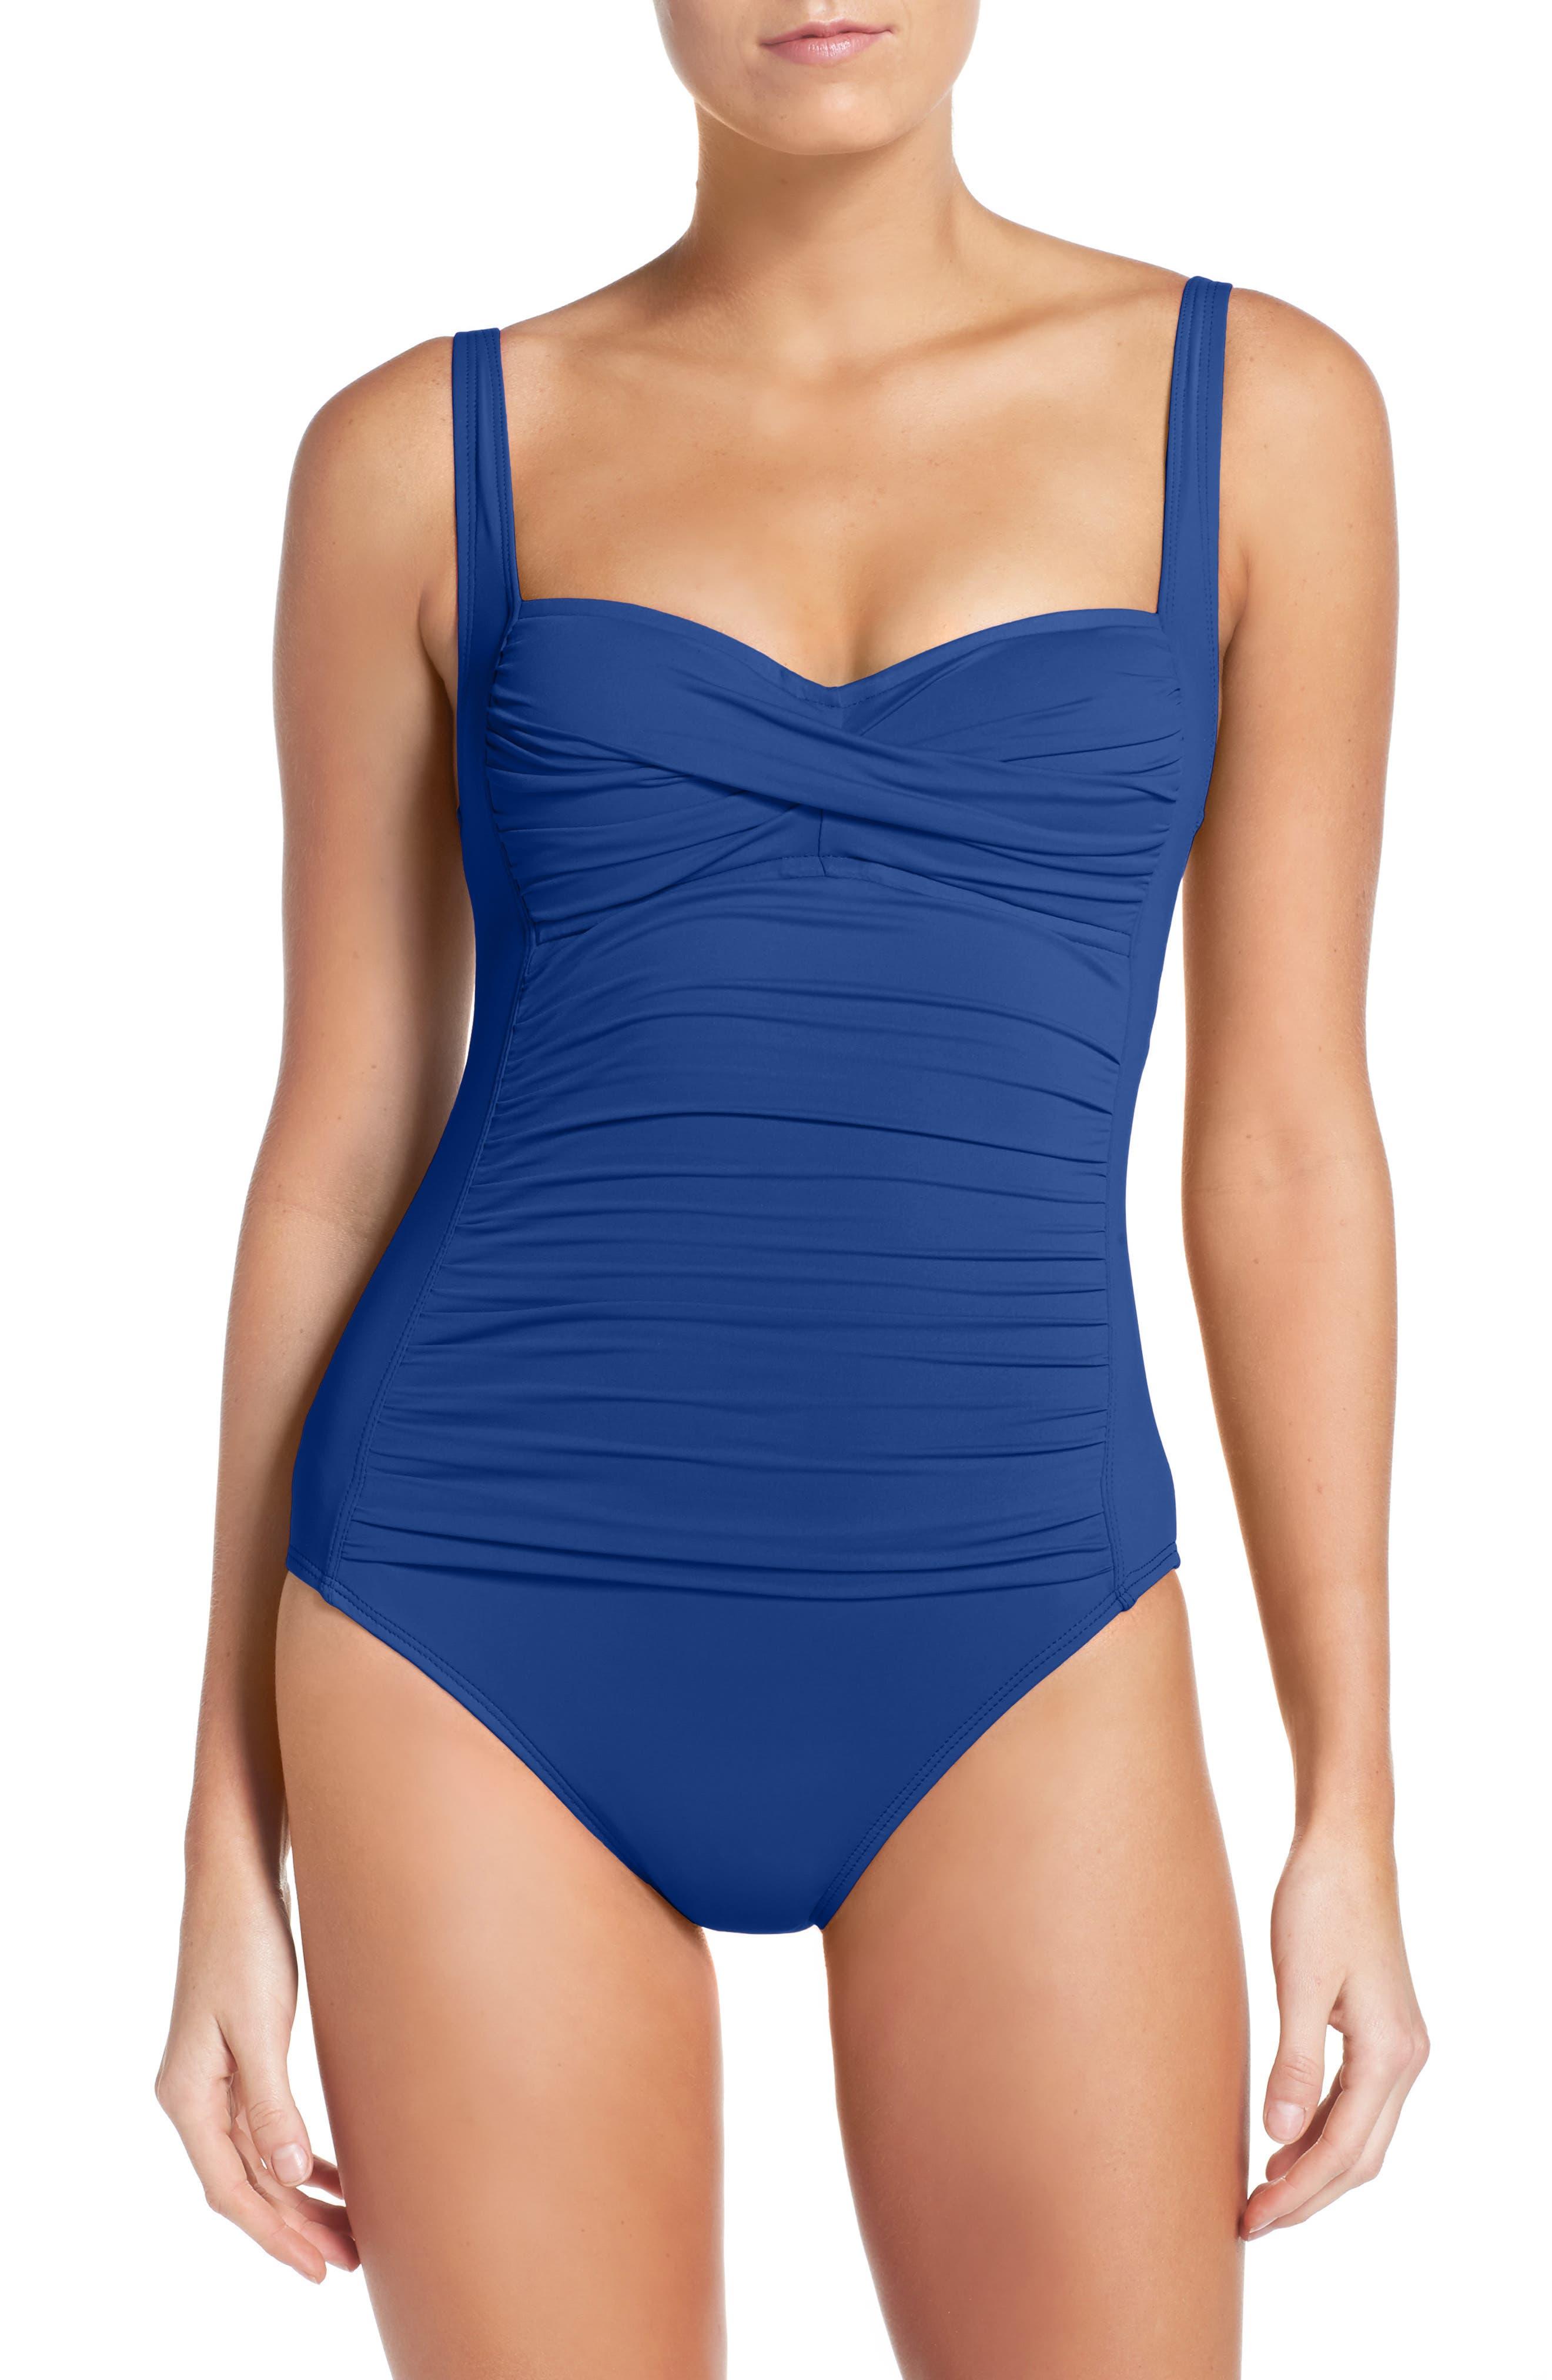 Alternate Image 1 Selected - La Blanca 'Sweetheart' One-Piece Swimsuit